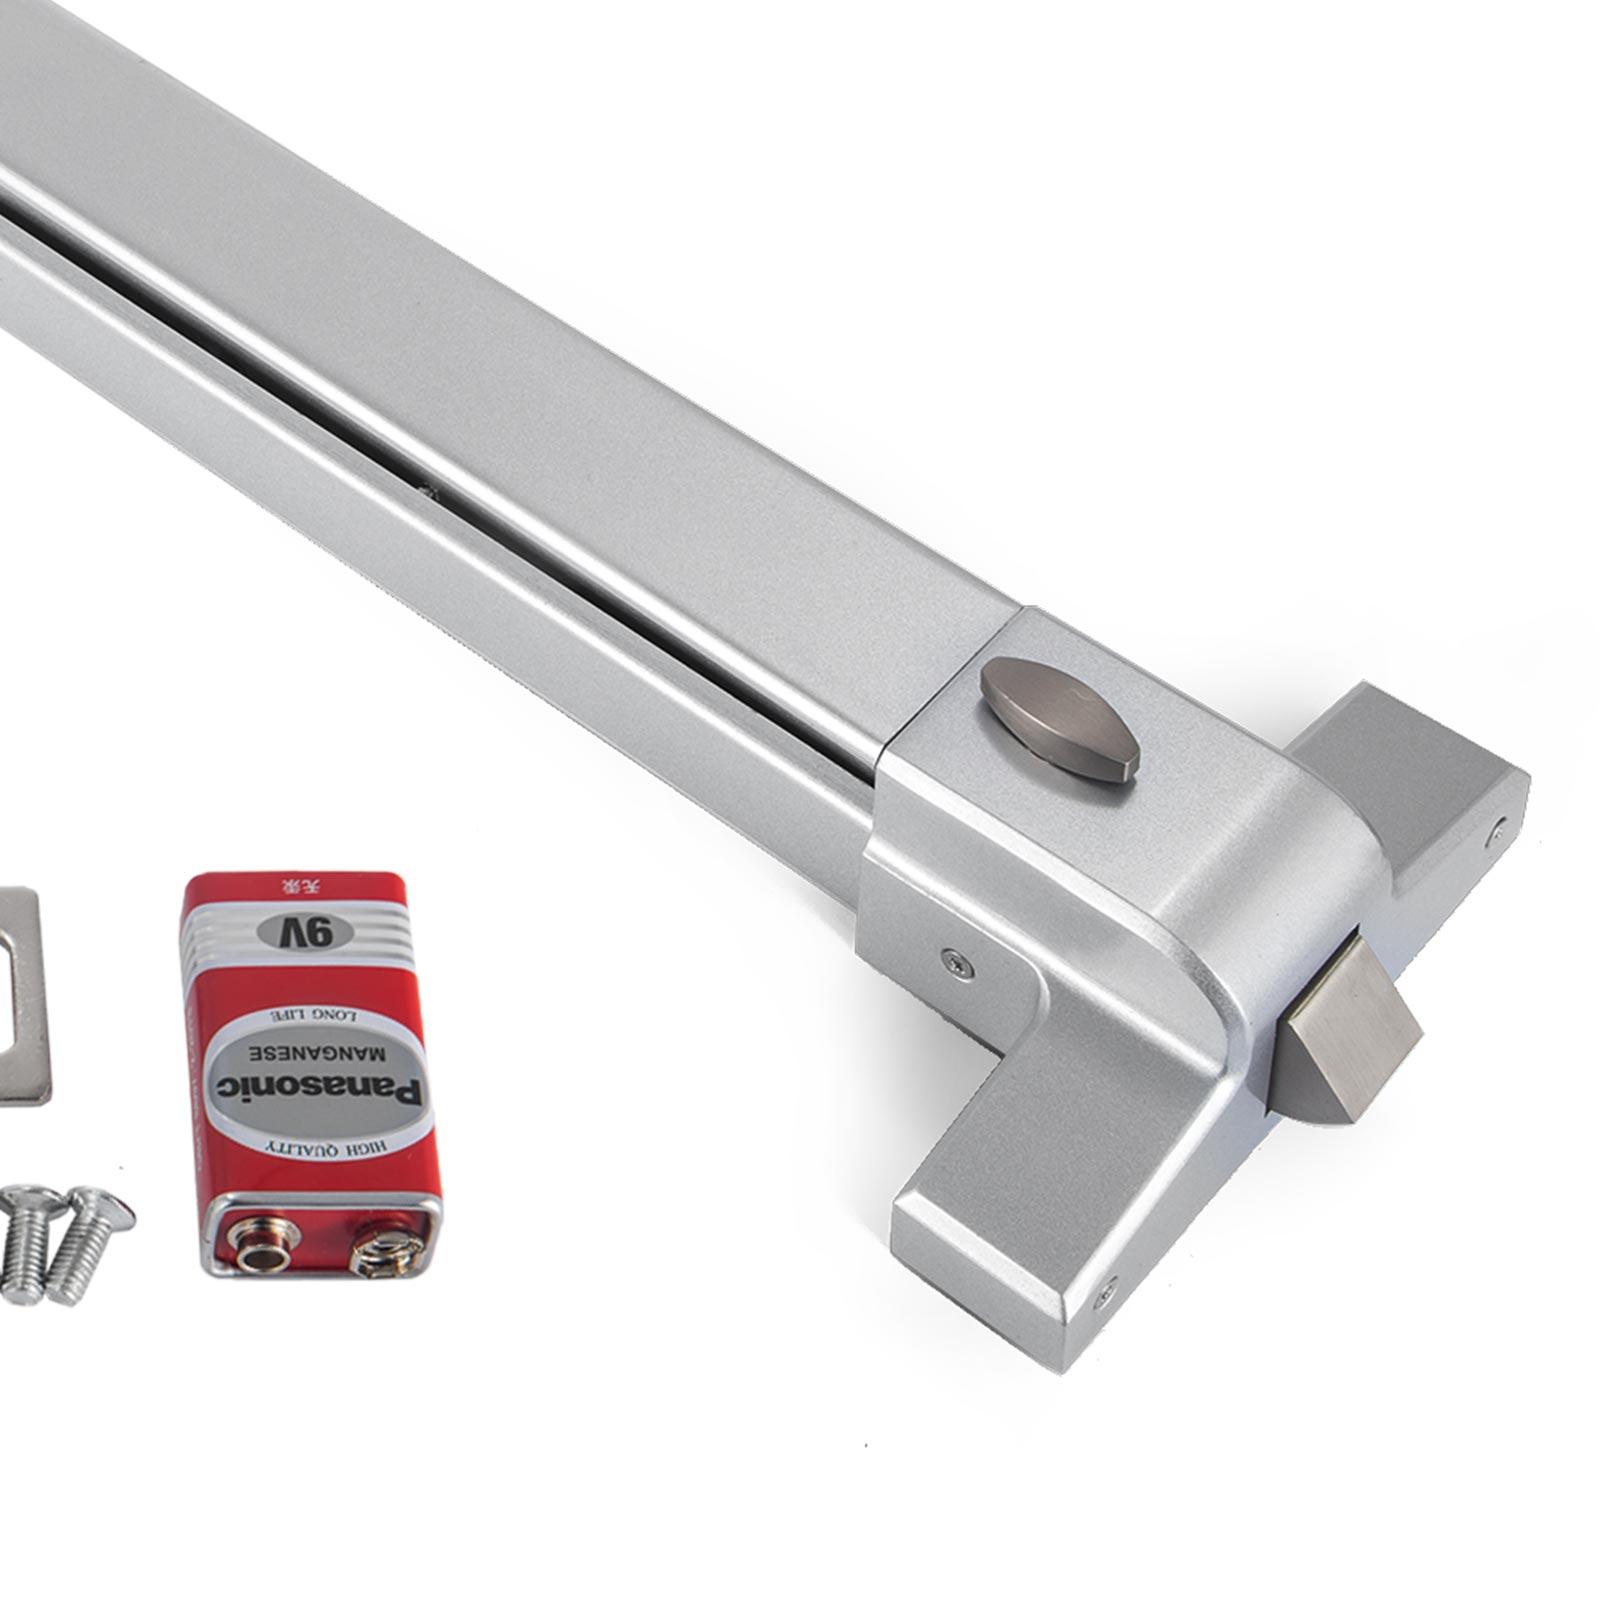 Door Push Panic Bar Exit Device Lock Handle/Alarm Heavy